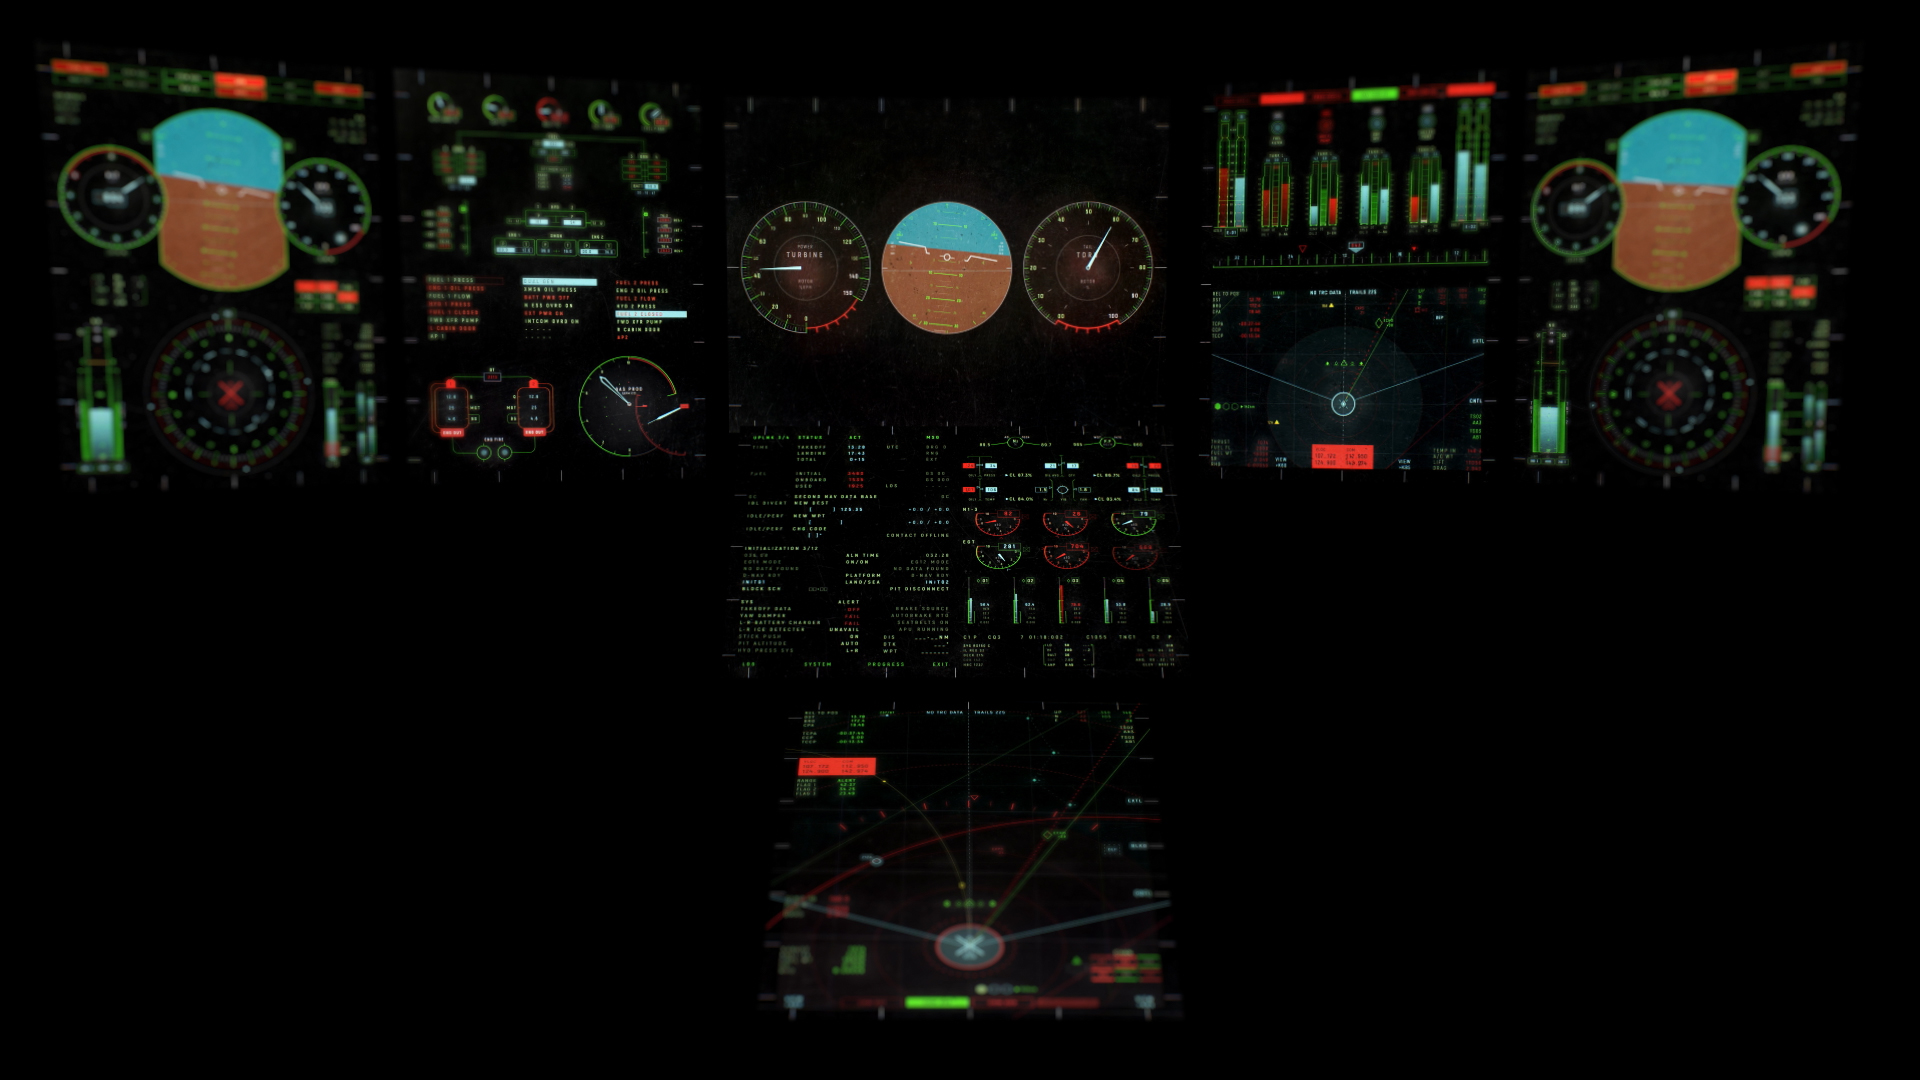 aa_heli_cockpit_cam_008.jpg